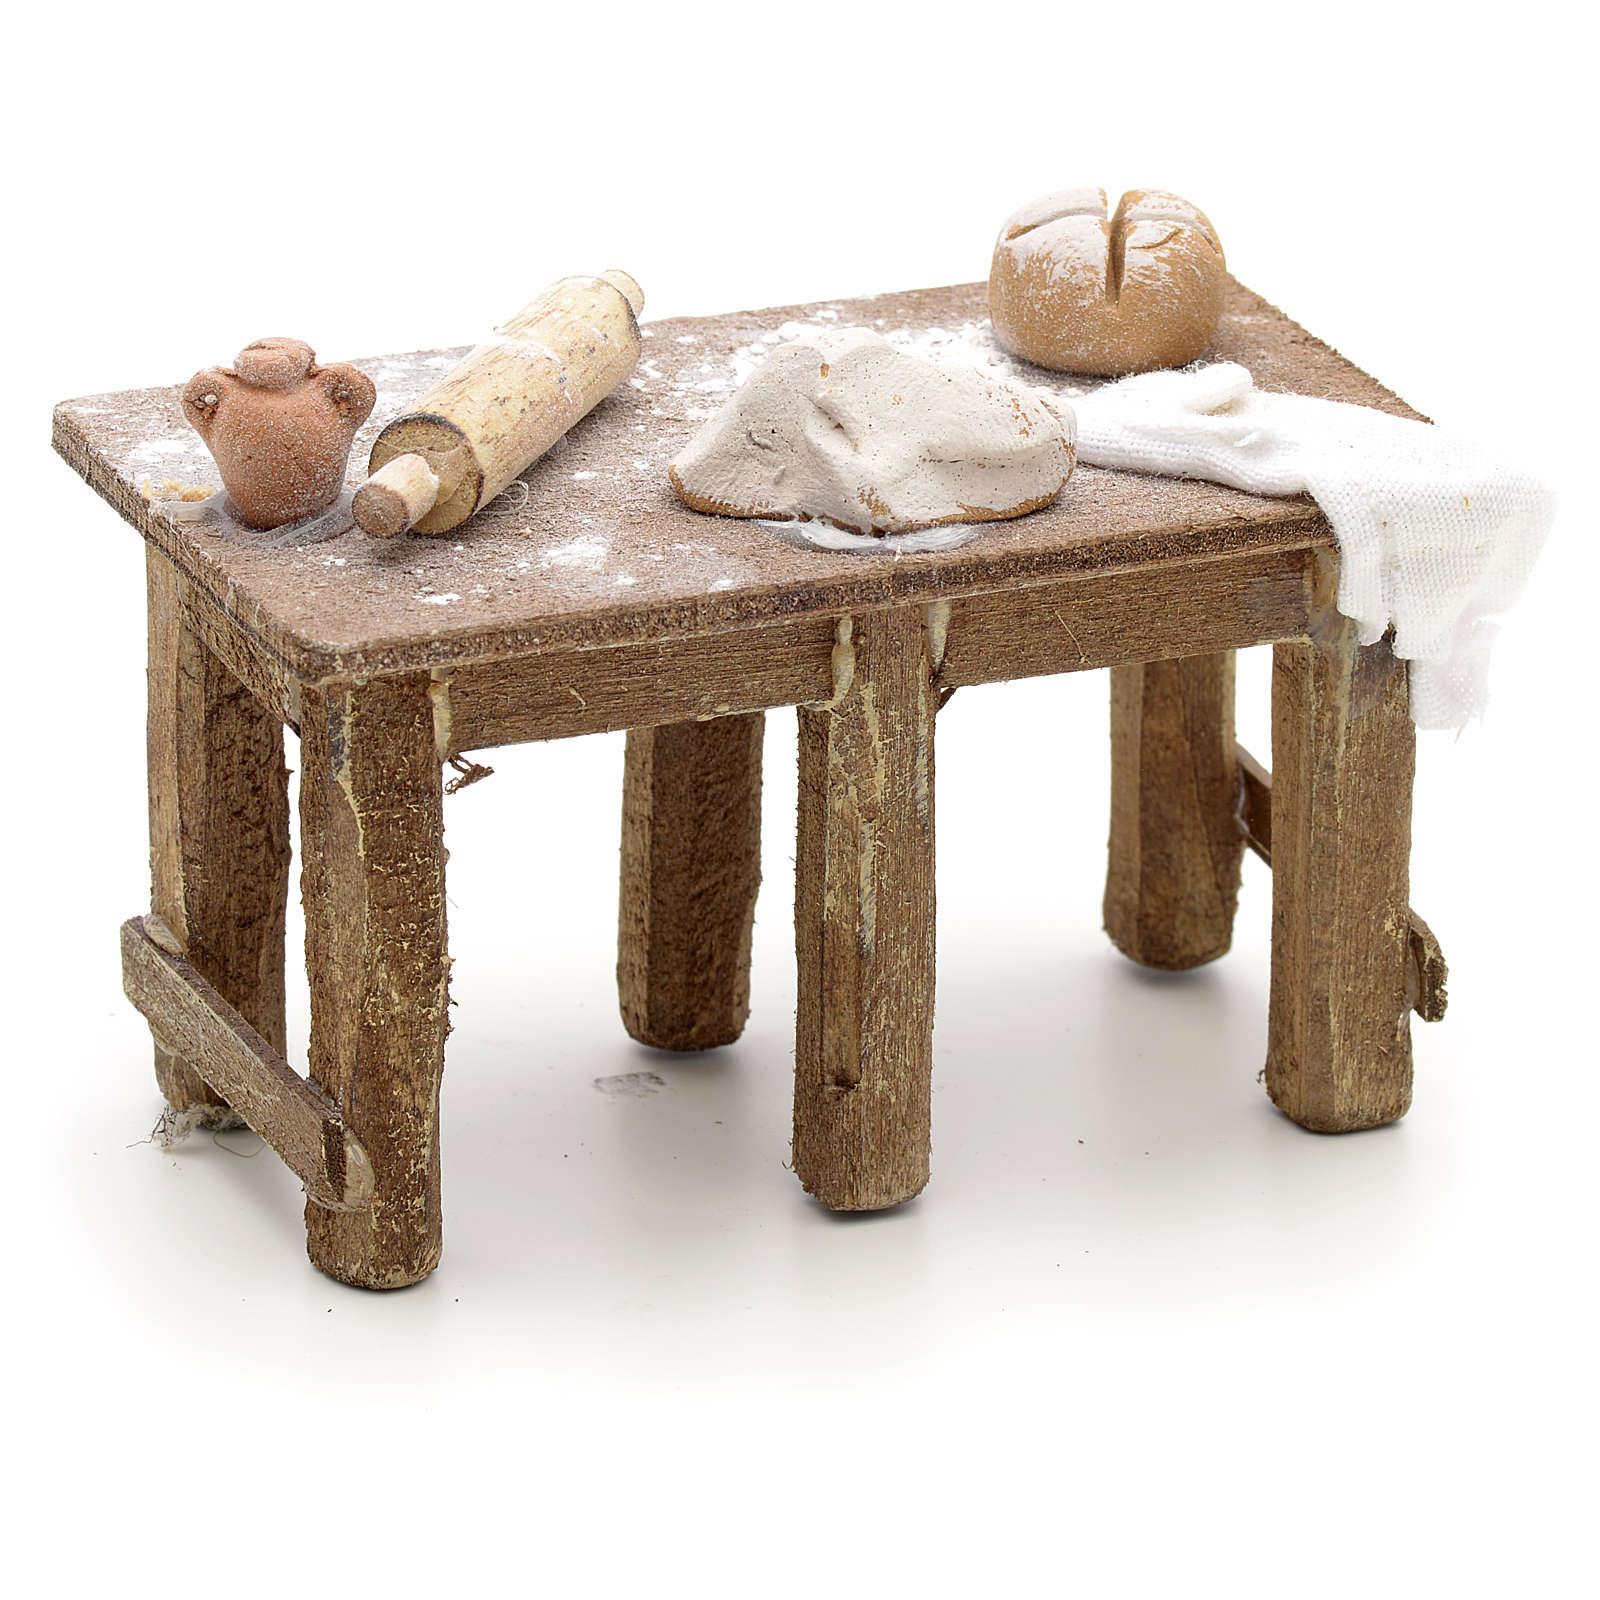 Neapolitan Nativity scene accessory, baker's table 4